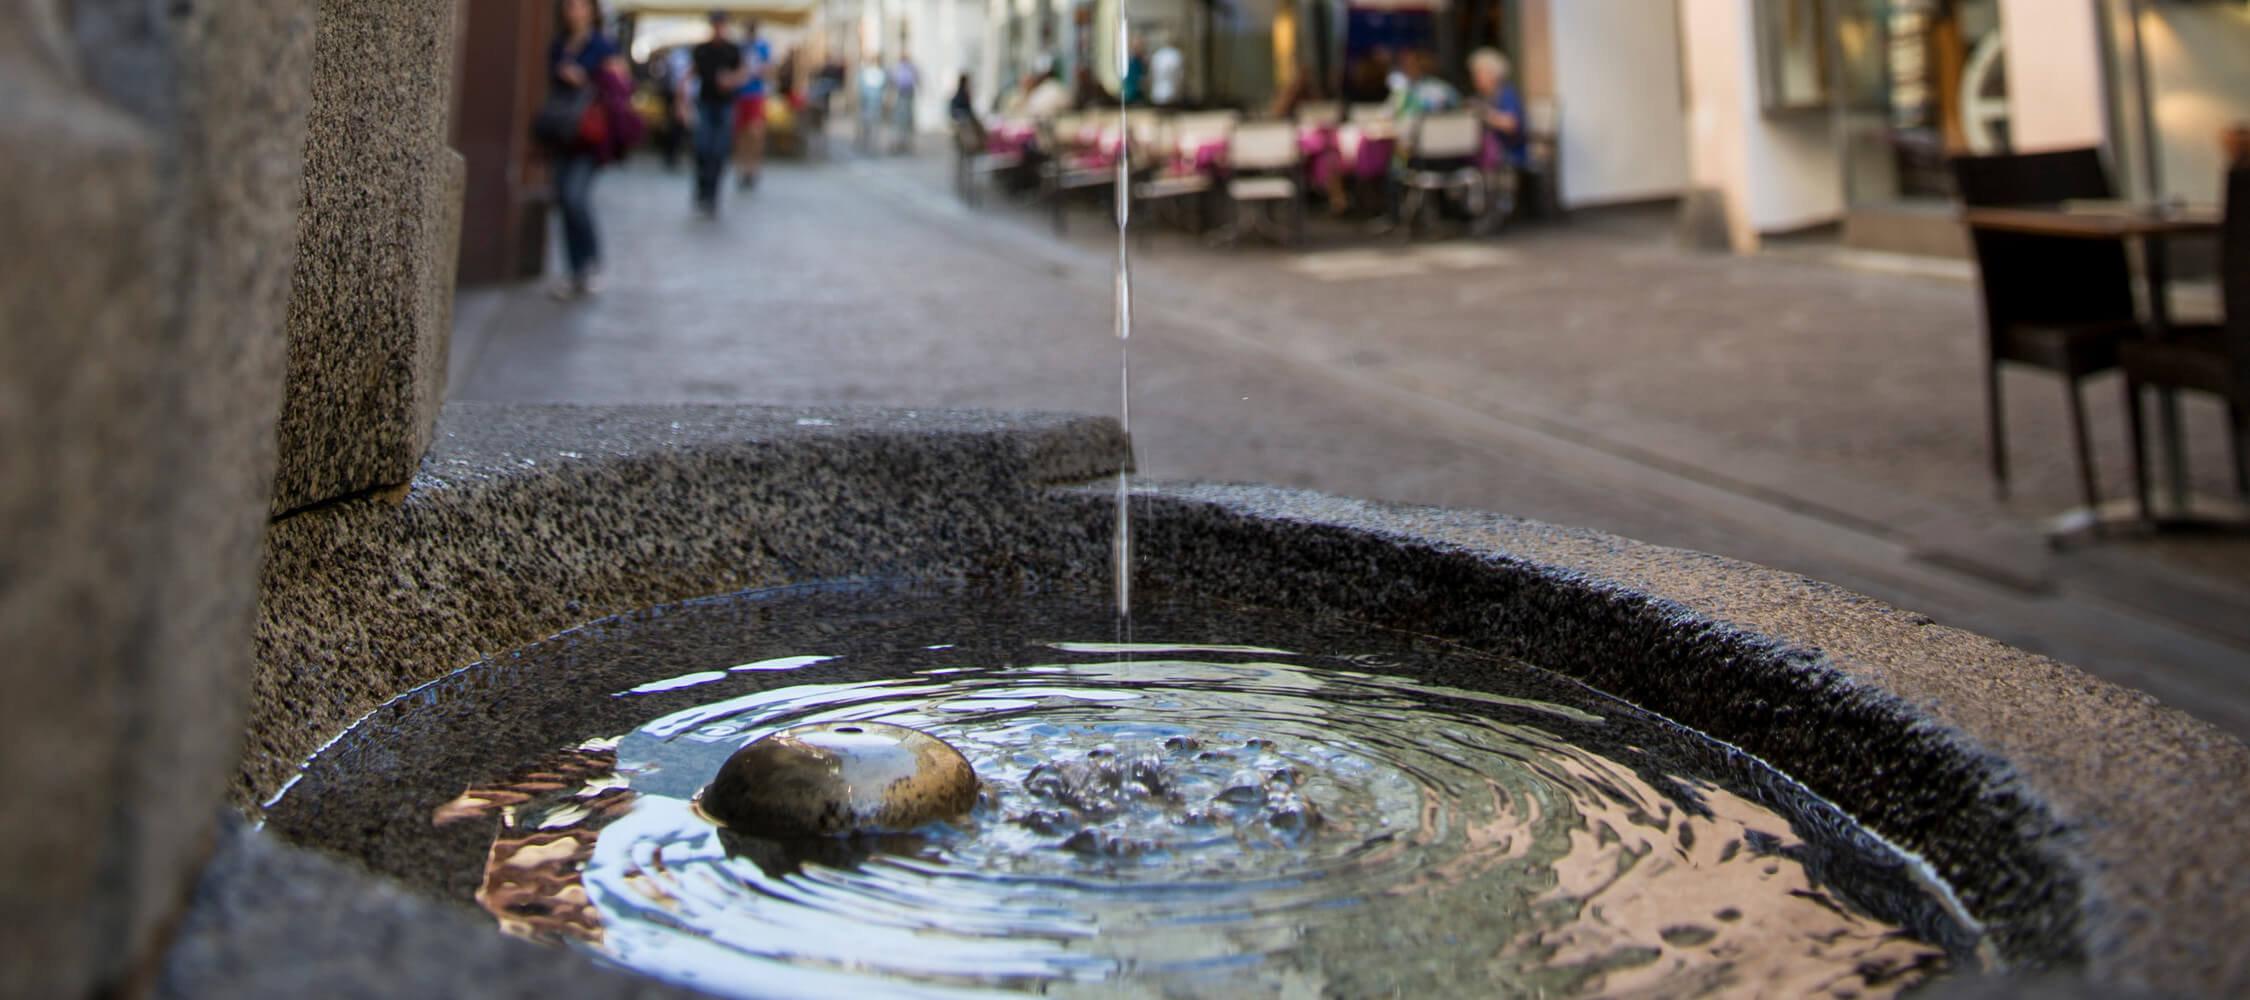 Italien-Trentino_Suedtirol_Alto_Adige_Merano_Meran_Wellness_Wasser_Brunnen_Altstadt_Lauben_Kurverwaltung-Alex-Filz_mgm01151kume_2250x1000